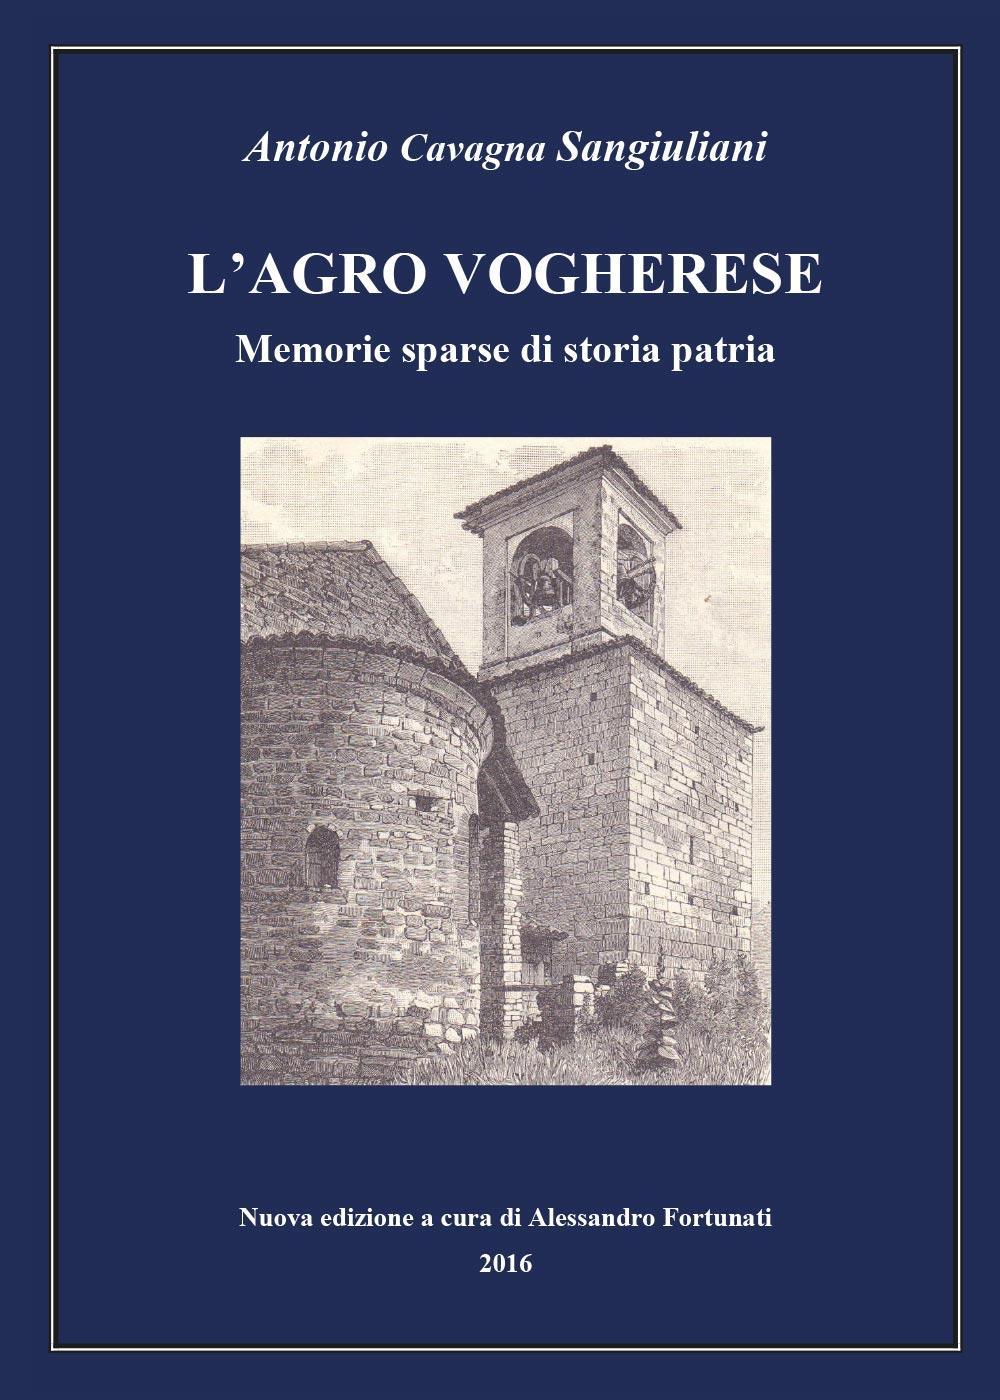 L'Agro Vogherese – Memorie sparse di storia patria